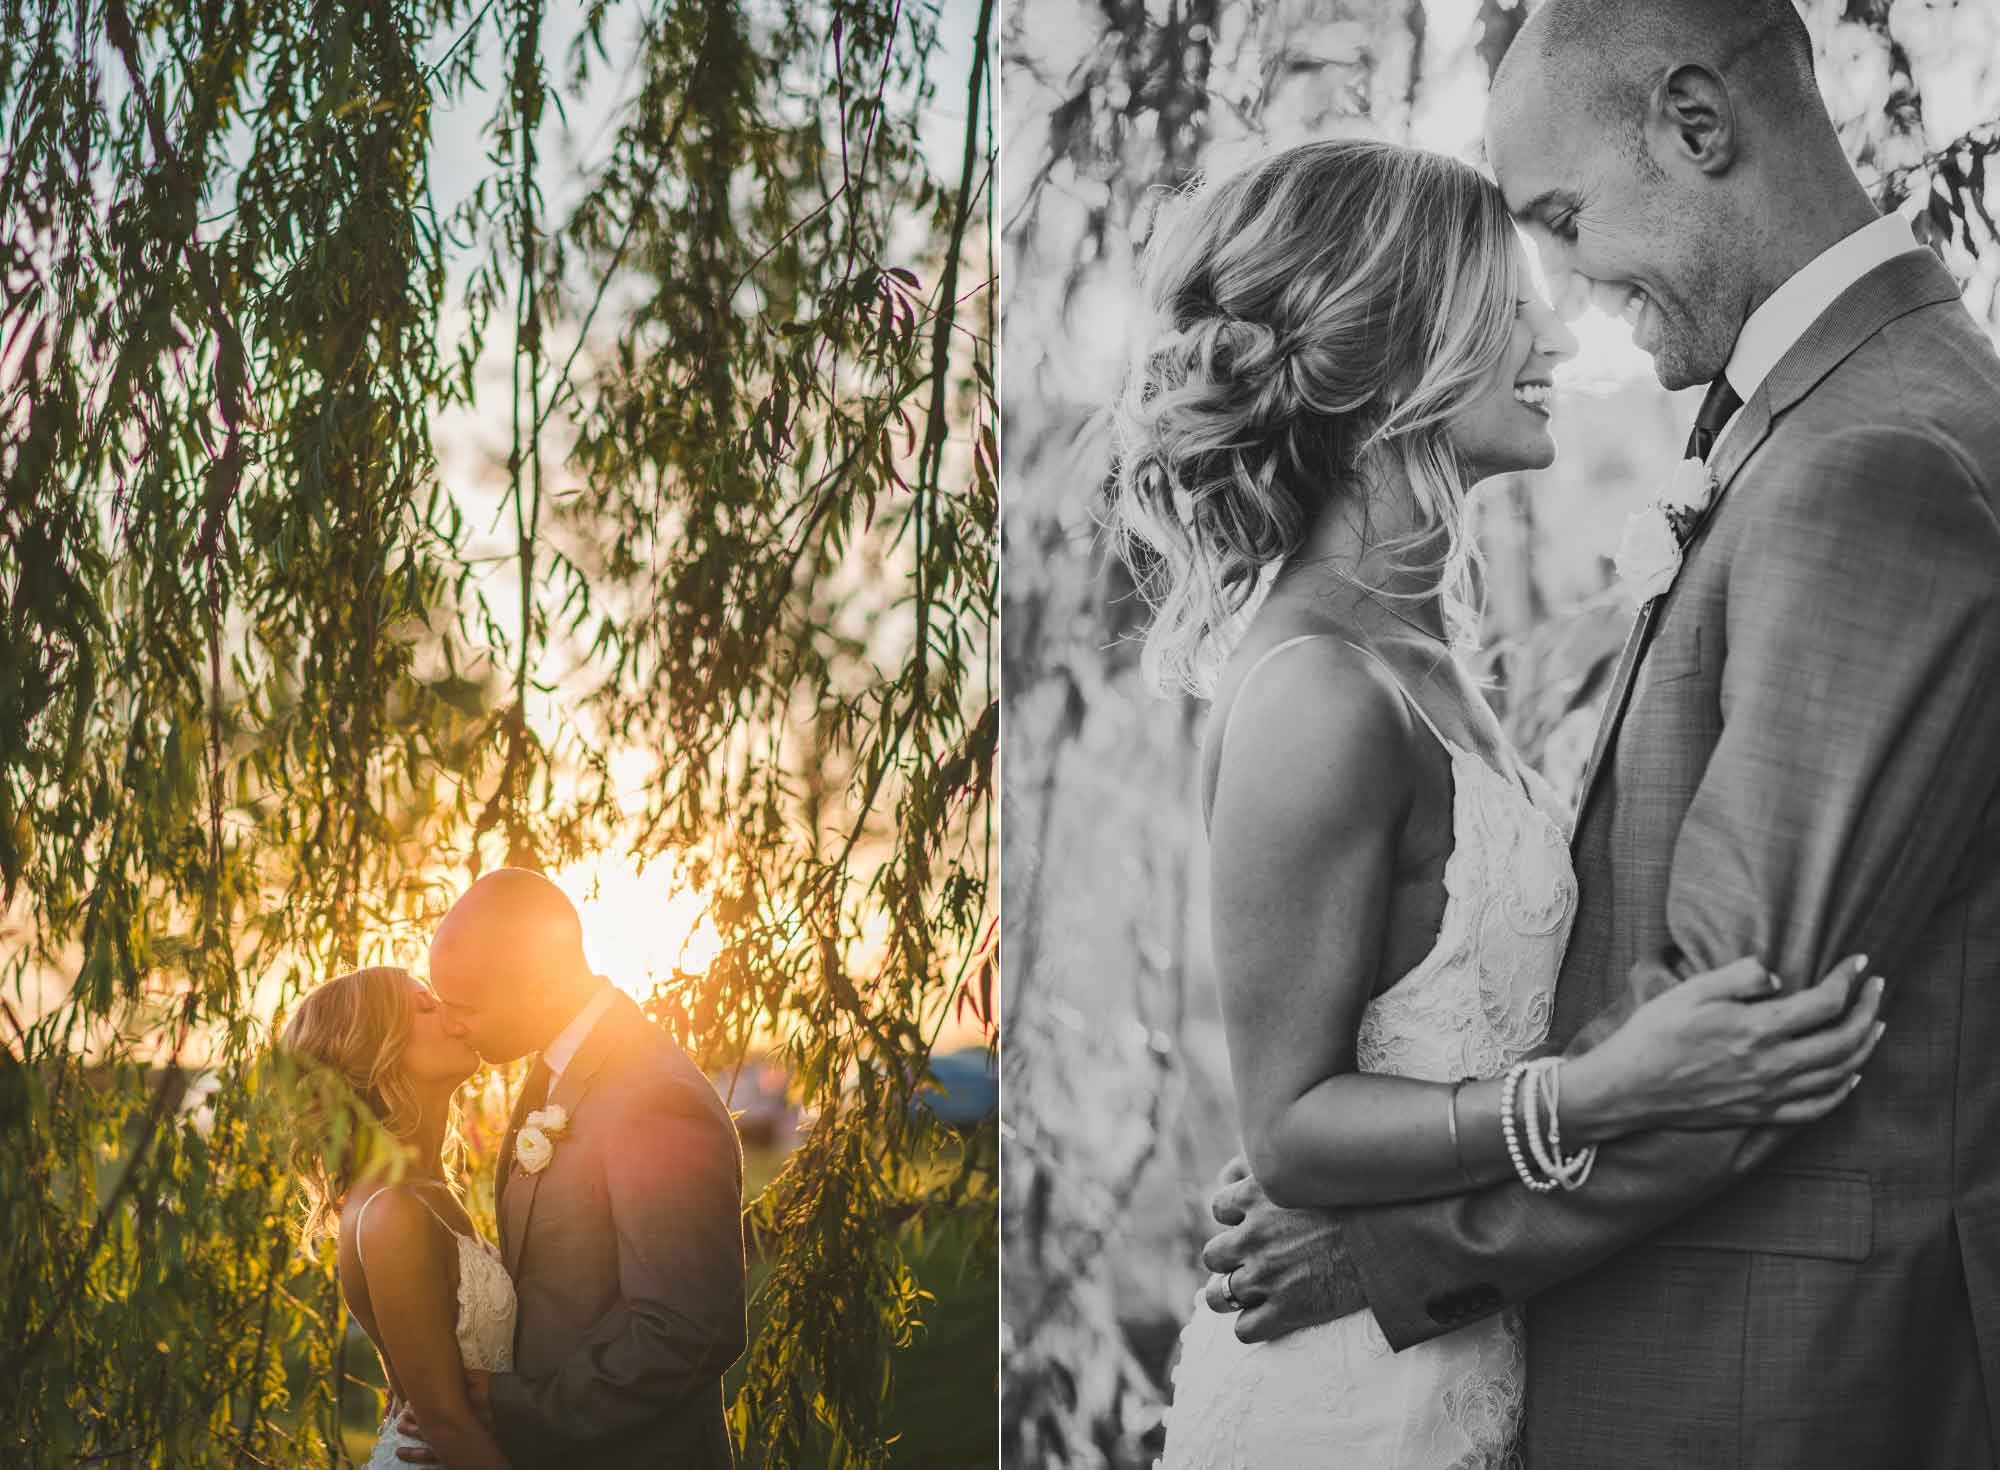 25-natural-light-sunset-wedding-portraits-bramblewood.jpg